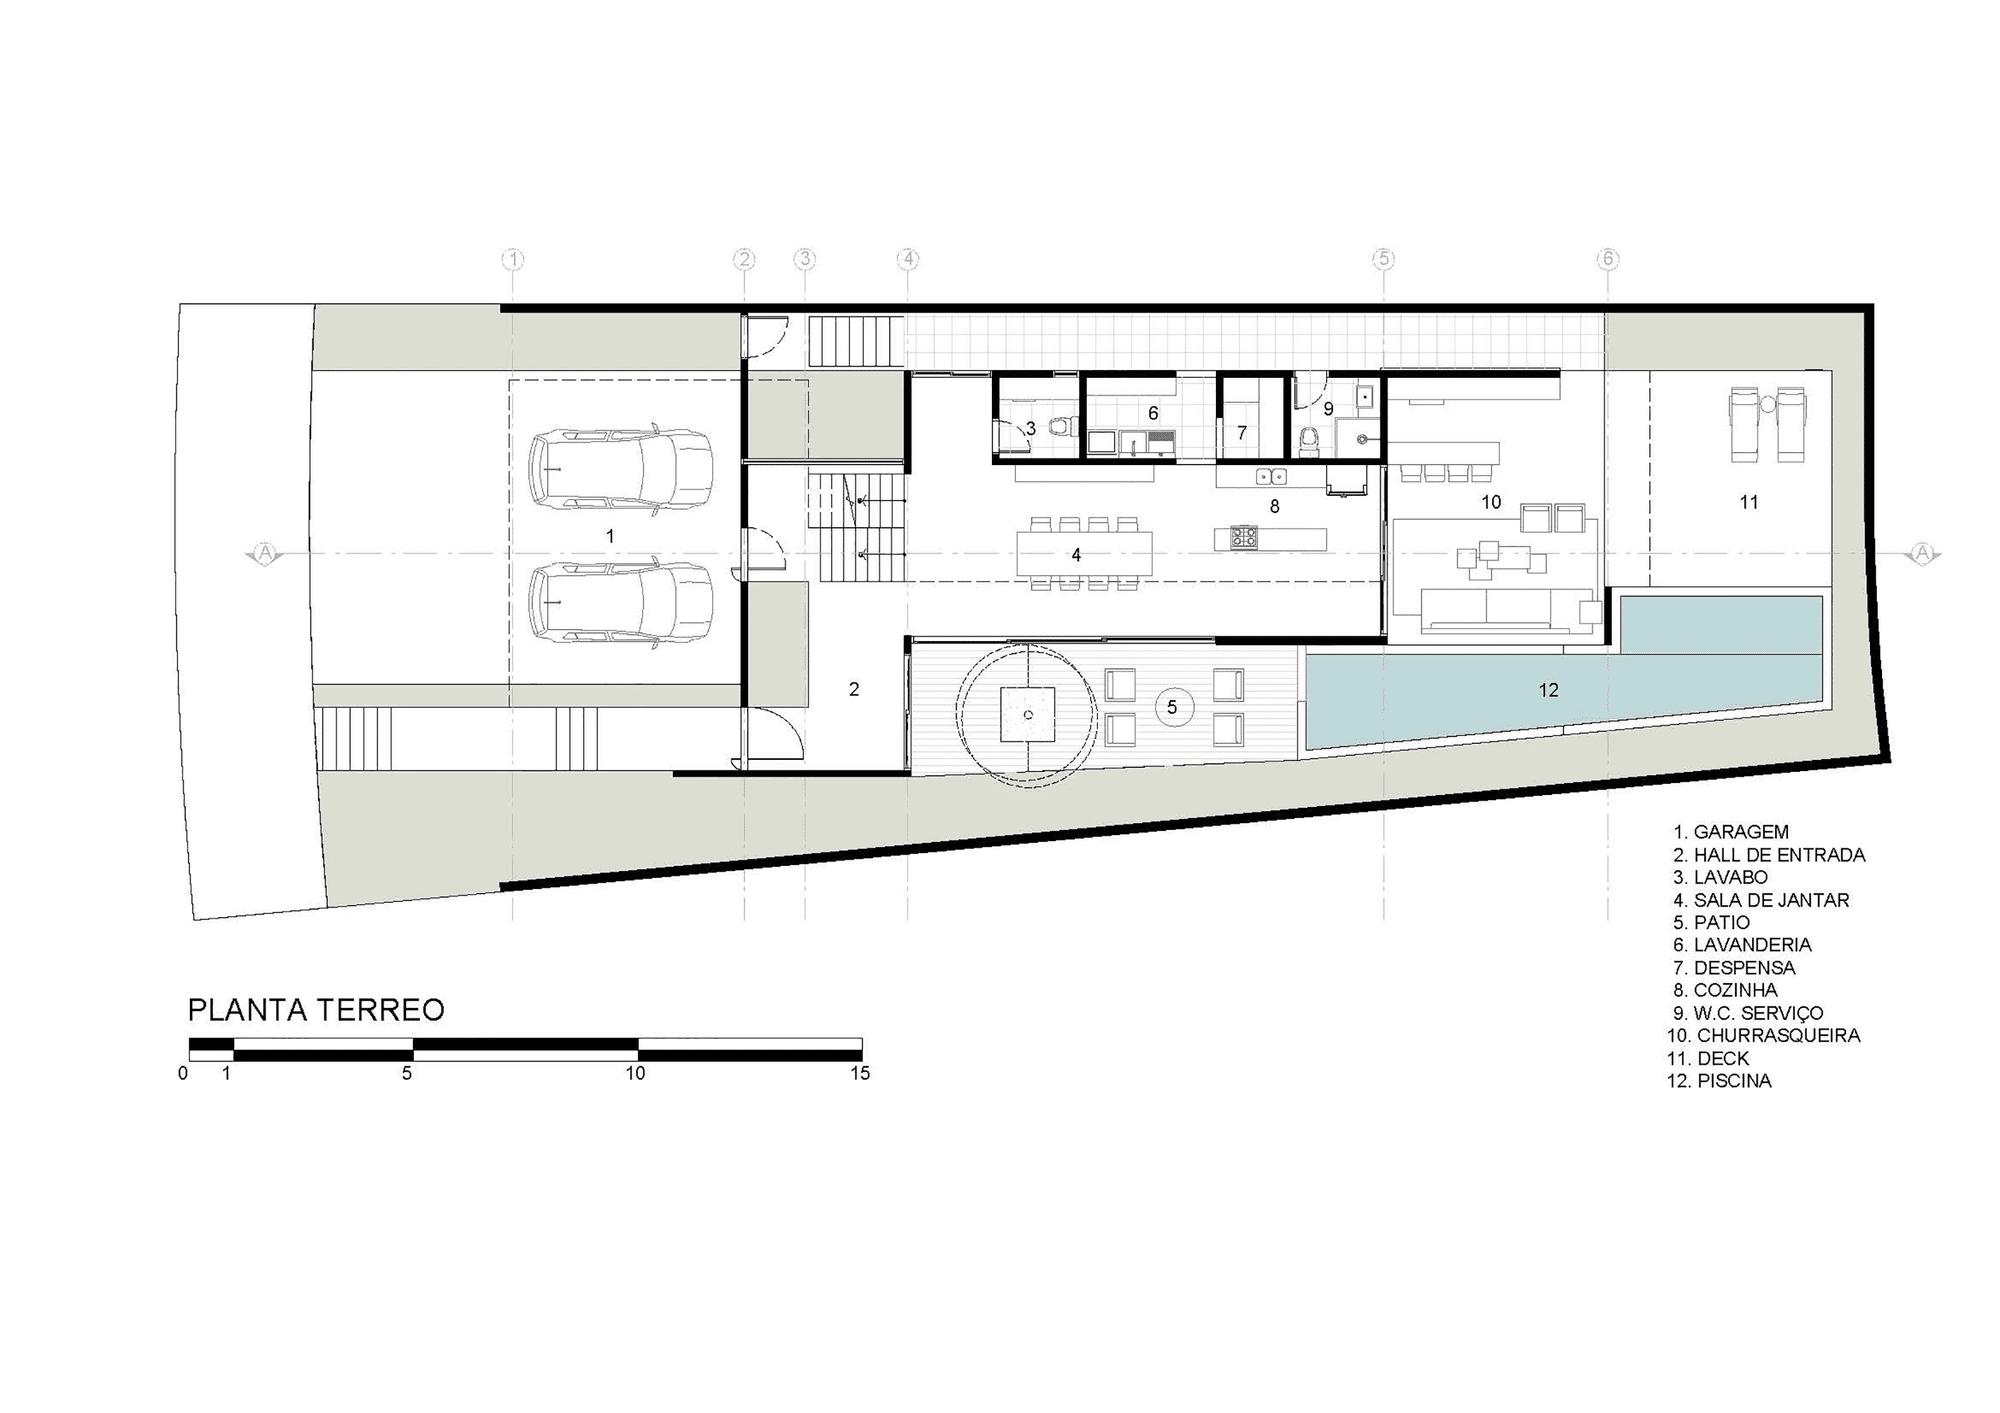 Dise o de moderna casa de dos pisos con fachada y planos for Planos de casas minimalistas grandes